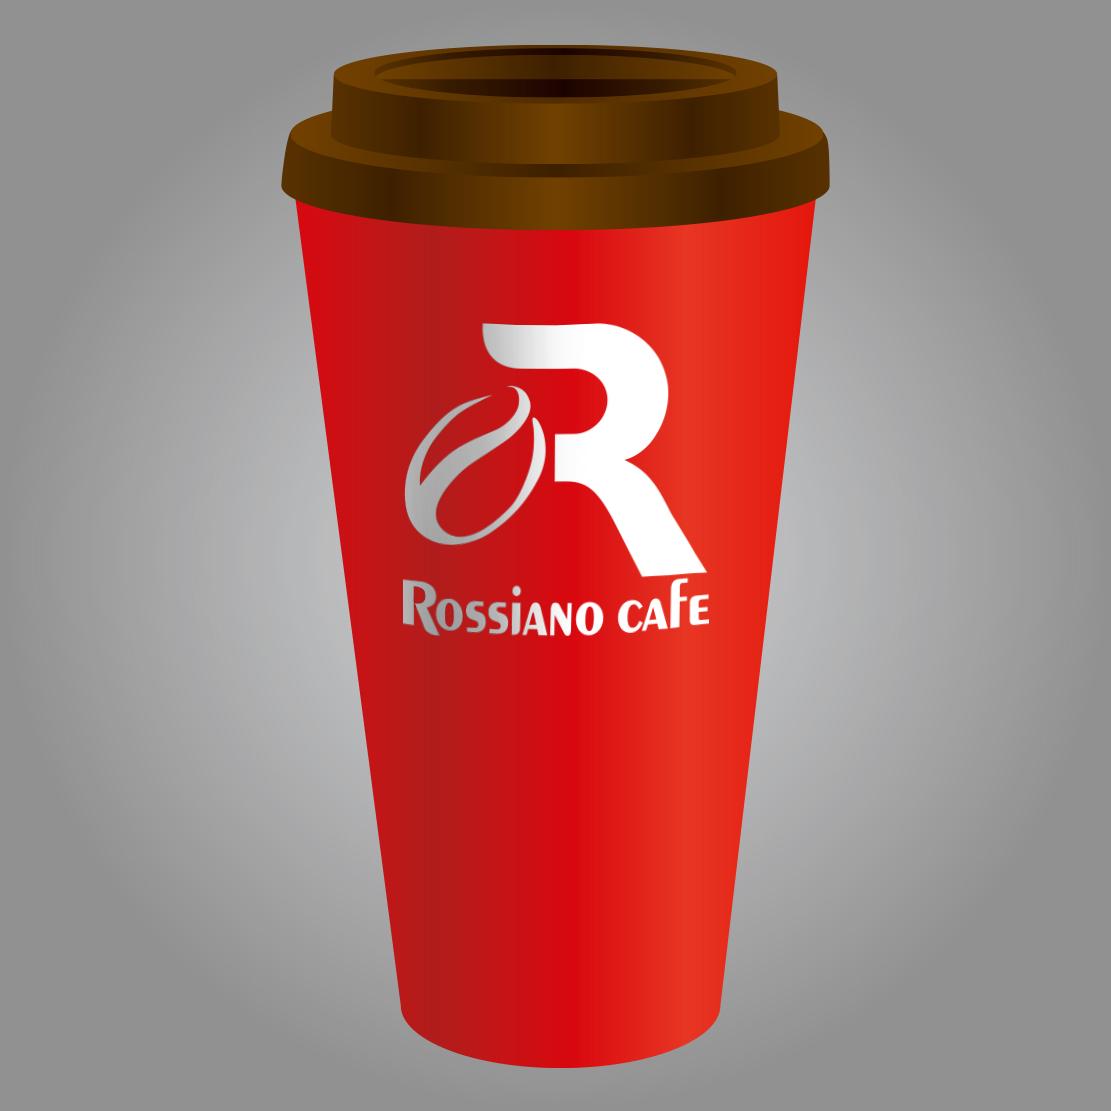 Логотип для кофейного бренда «Rossiano cafe». фото f_81557c7d18cd8fb3.jpg